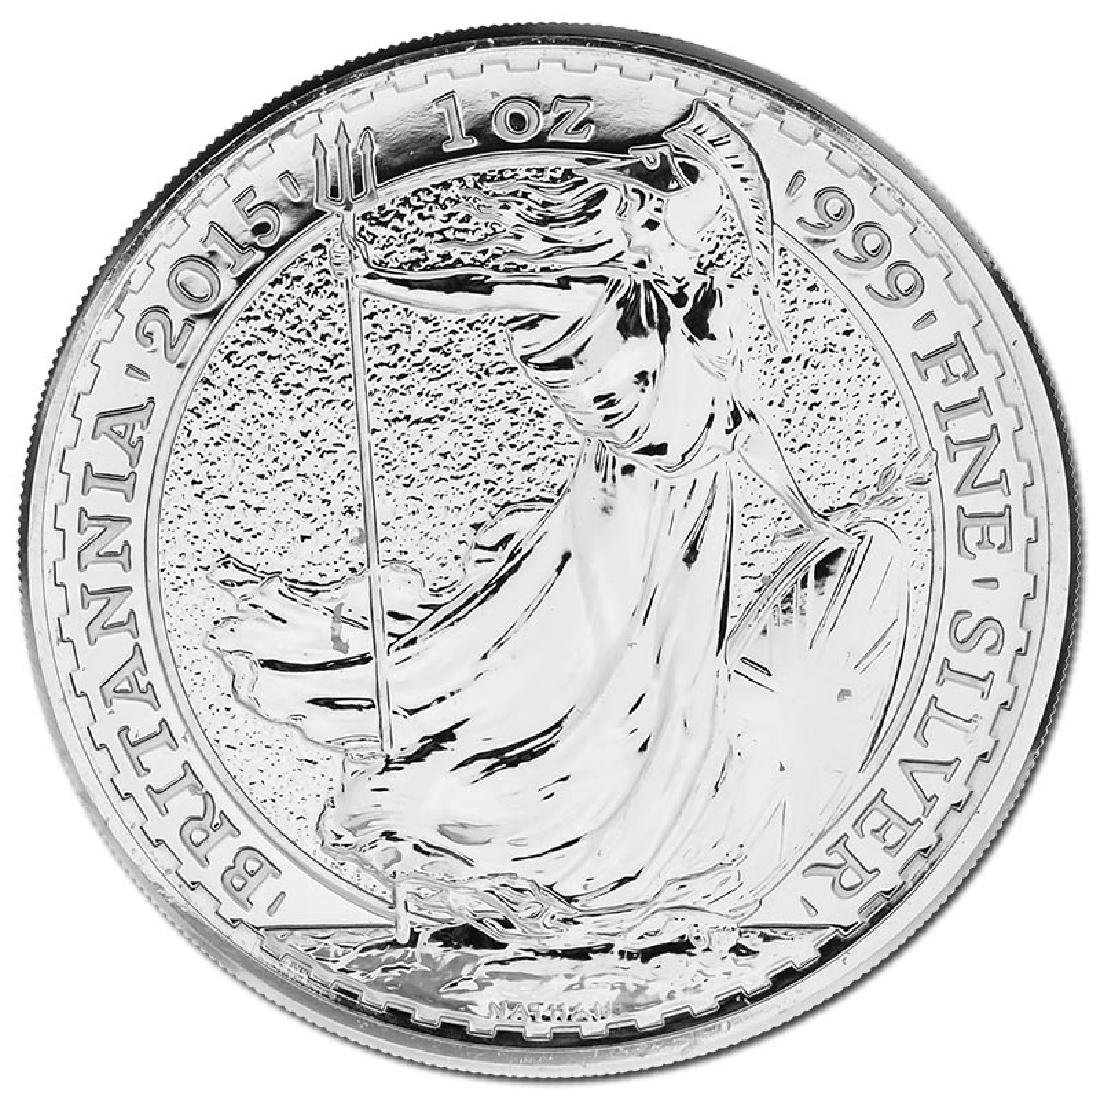 Uncirculated Silver Britannia 1 oz 2015